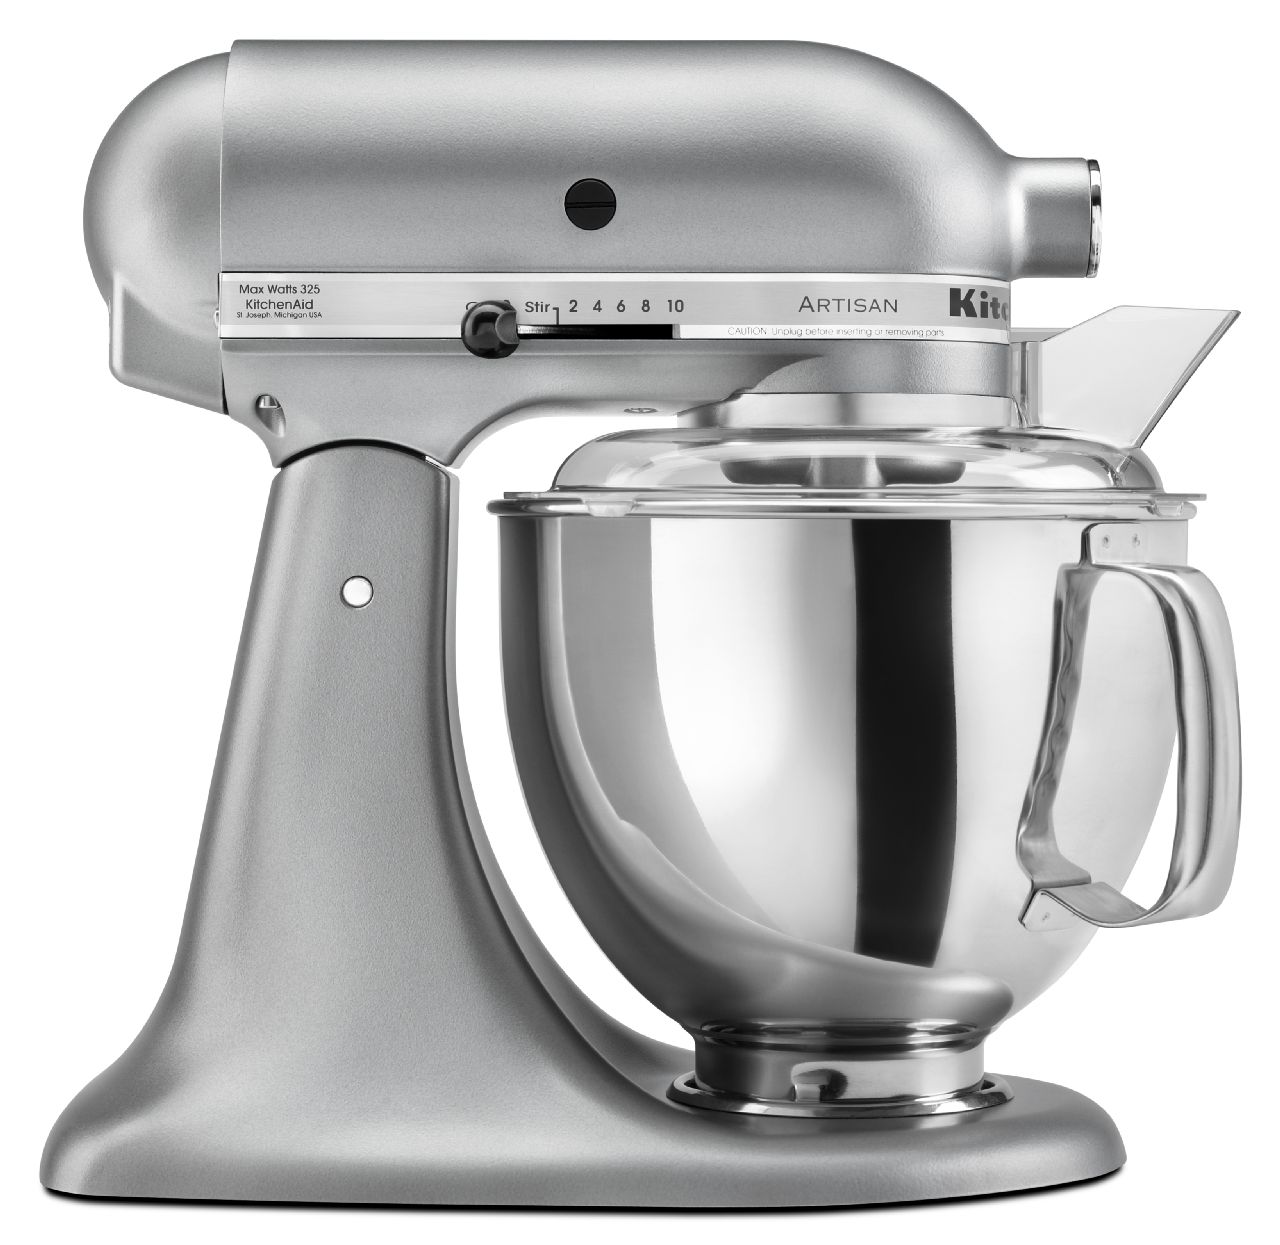 KitchenAid-Artisan-Series-5-Quart-Tilt-Head-Stand-Mixer-10-Speeds-KSM150PS thumbnail 107